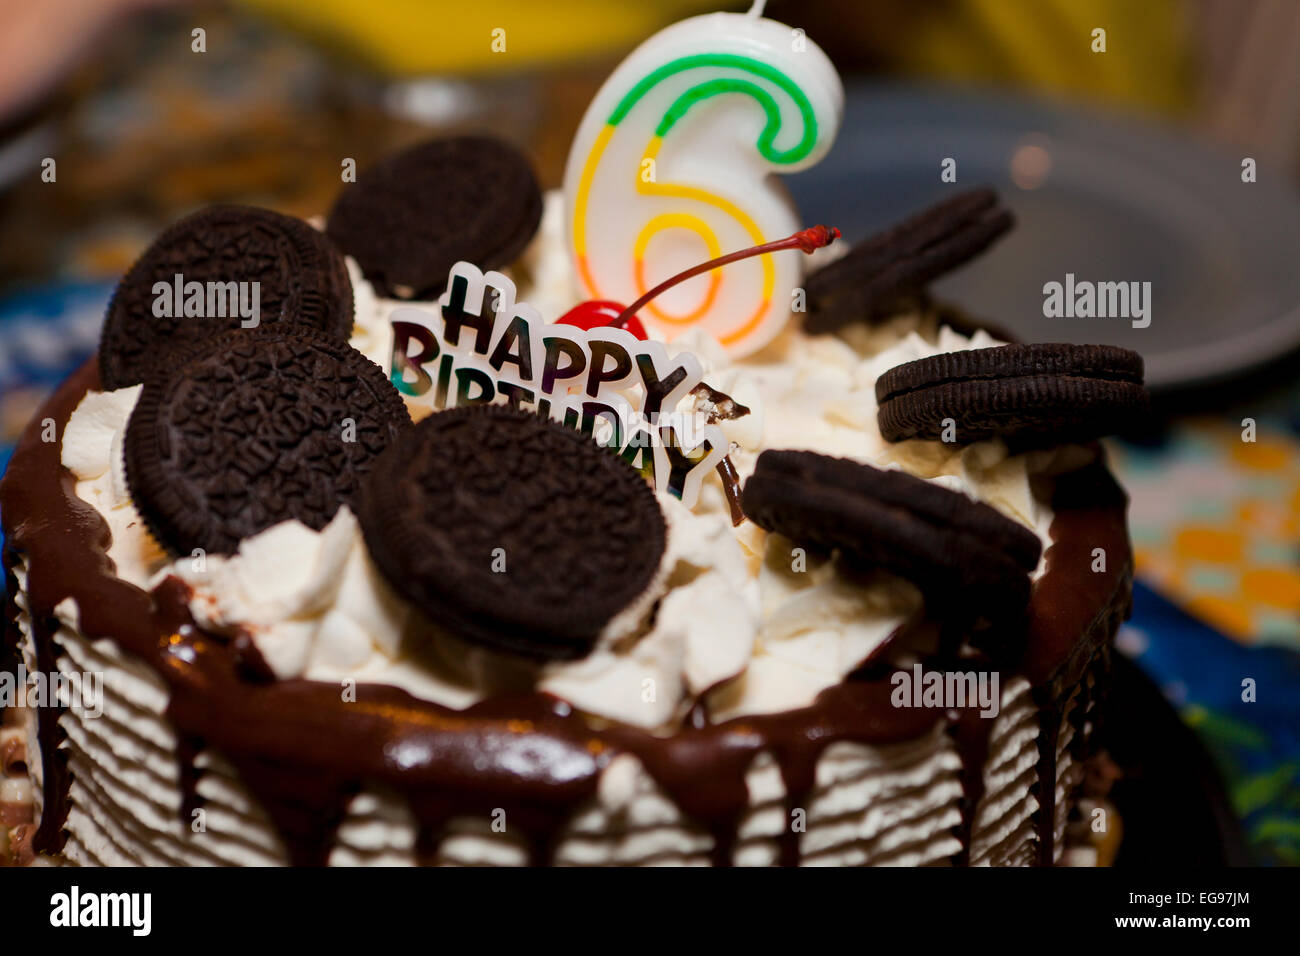 Chocolate Oreo cookies birthday cake for 6 year old child - USA - Stock Image